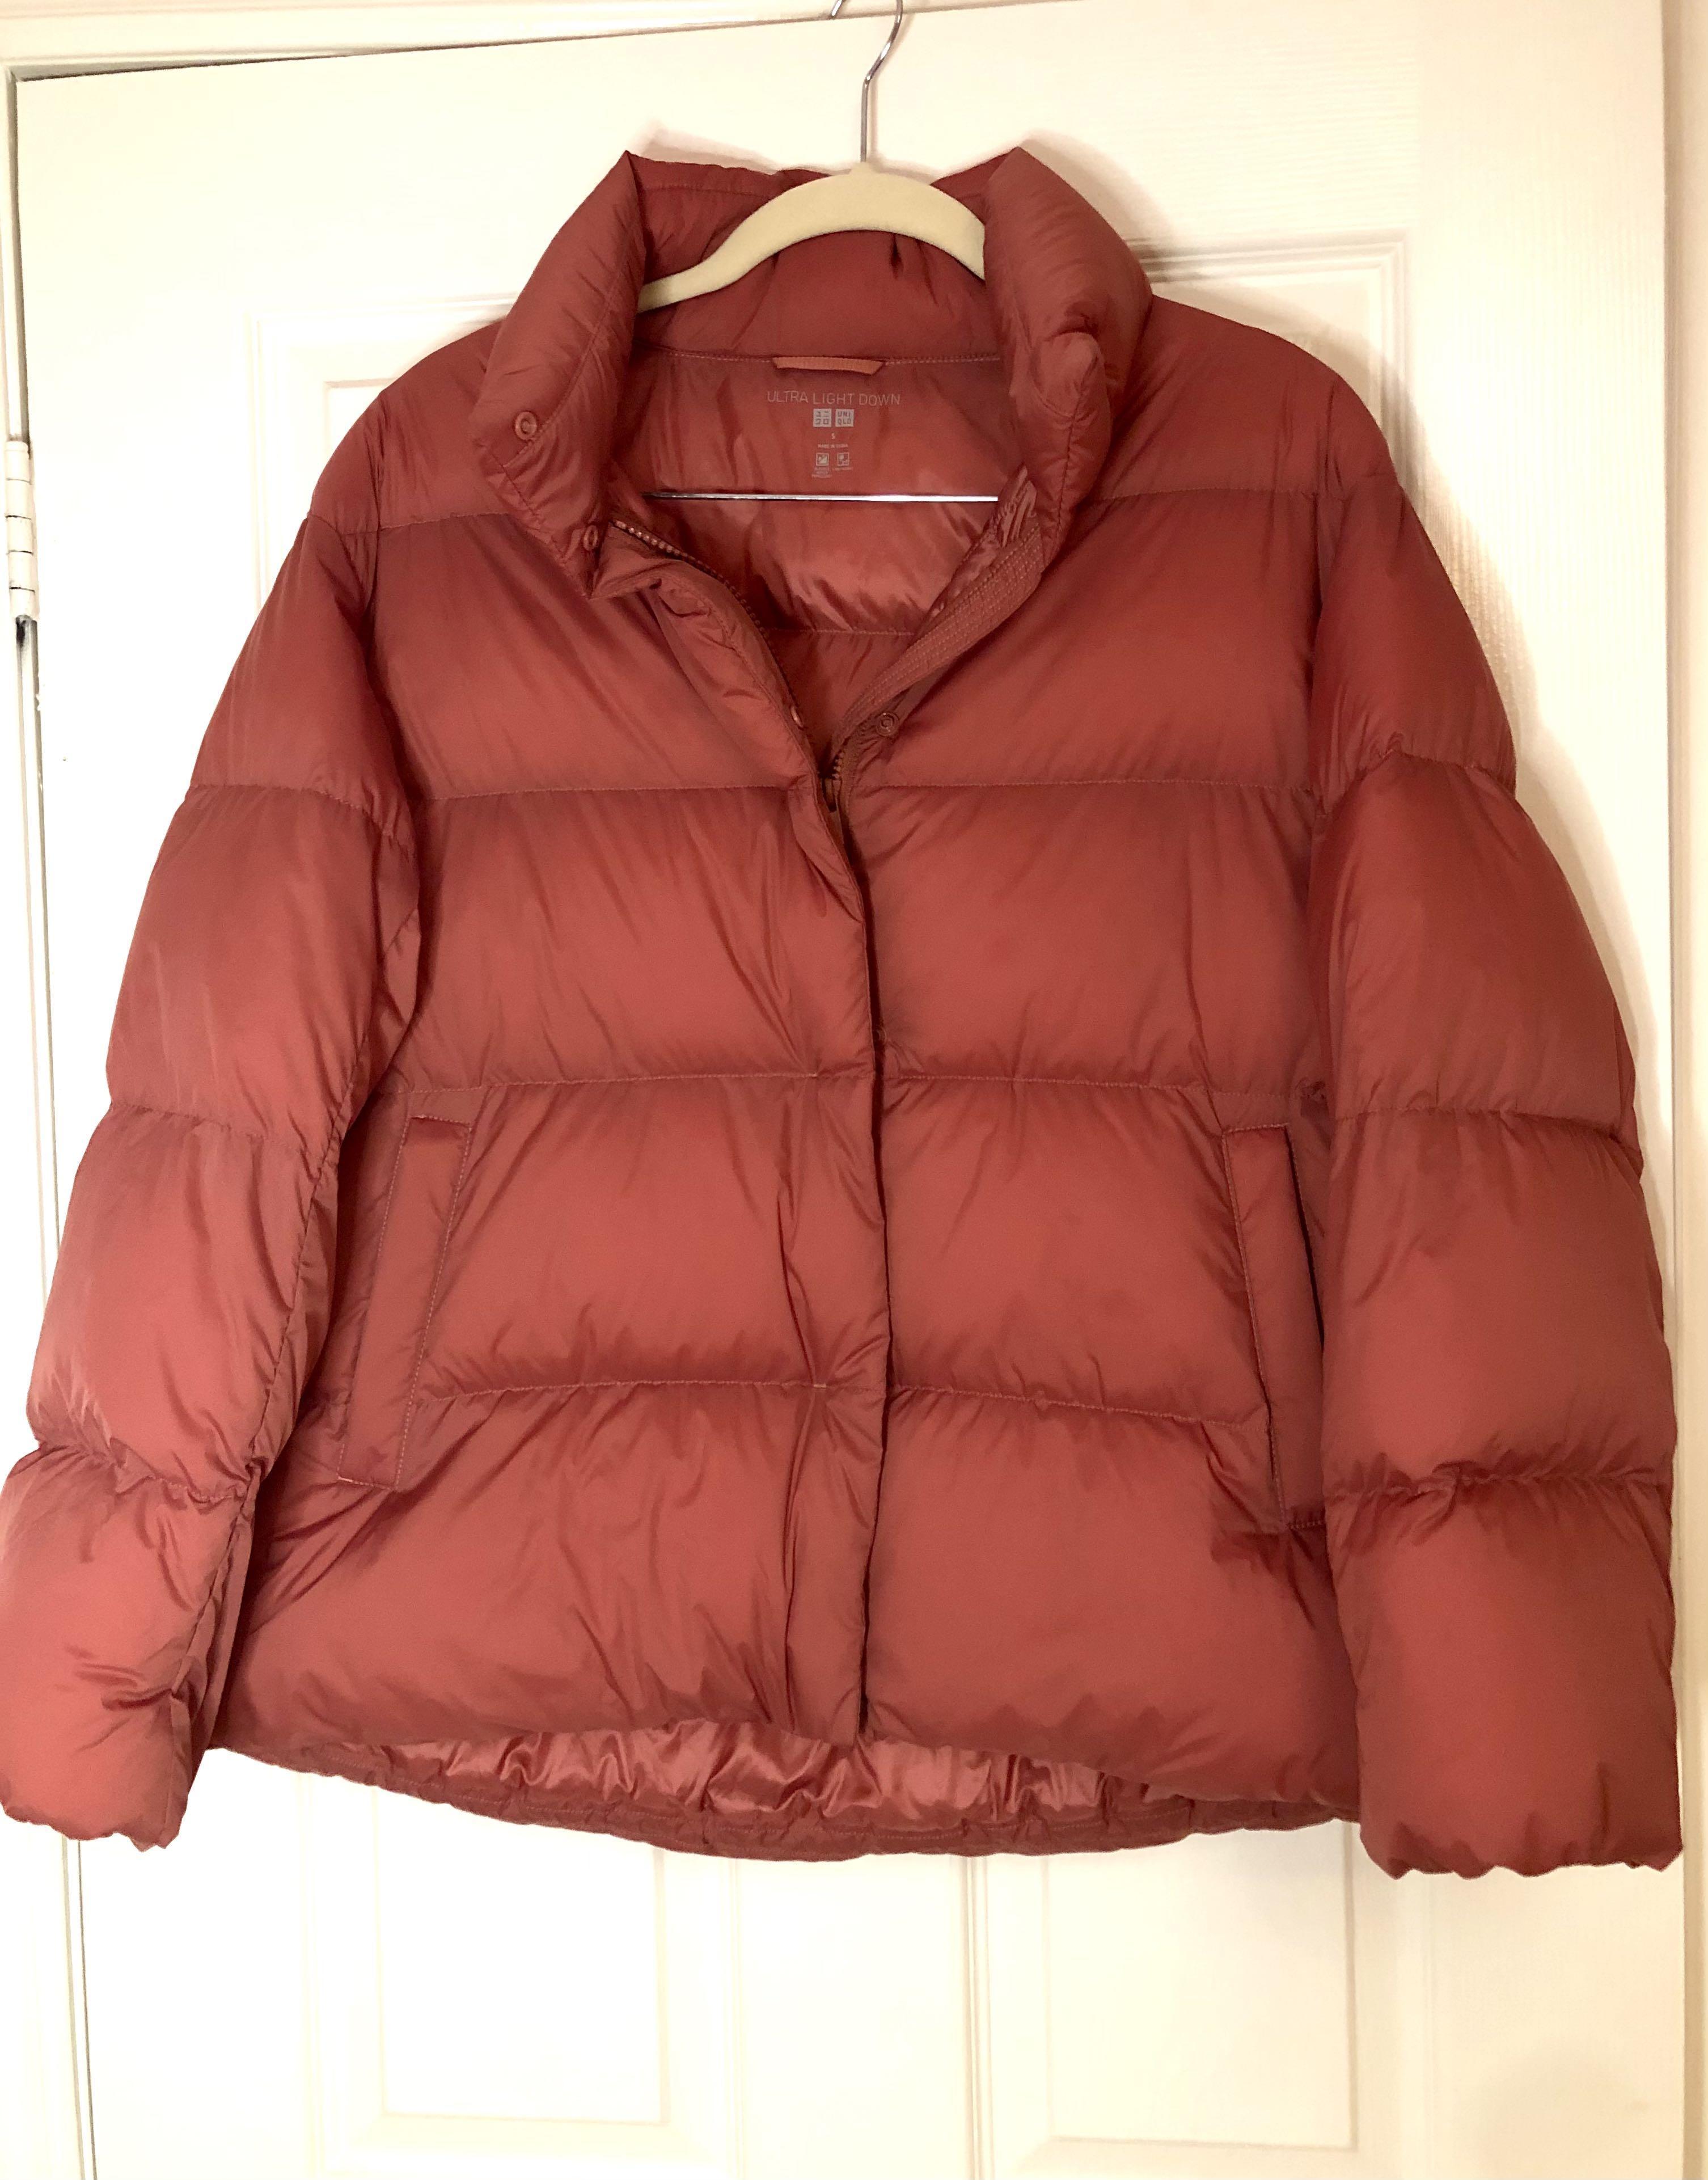 UNIQLO Ultra Light Down Puffer Jacket